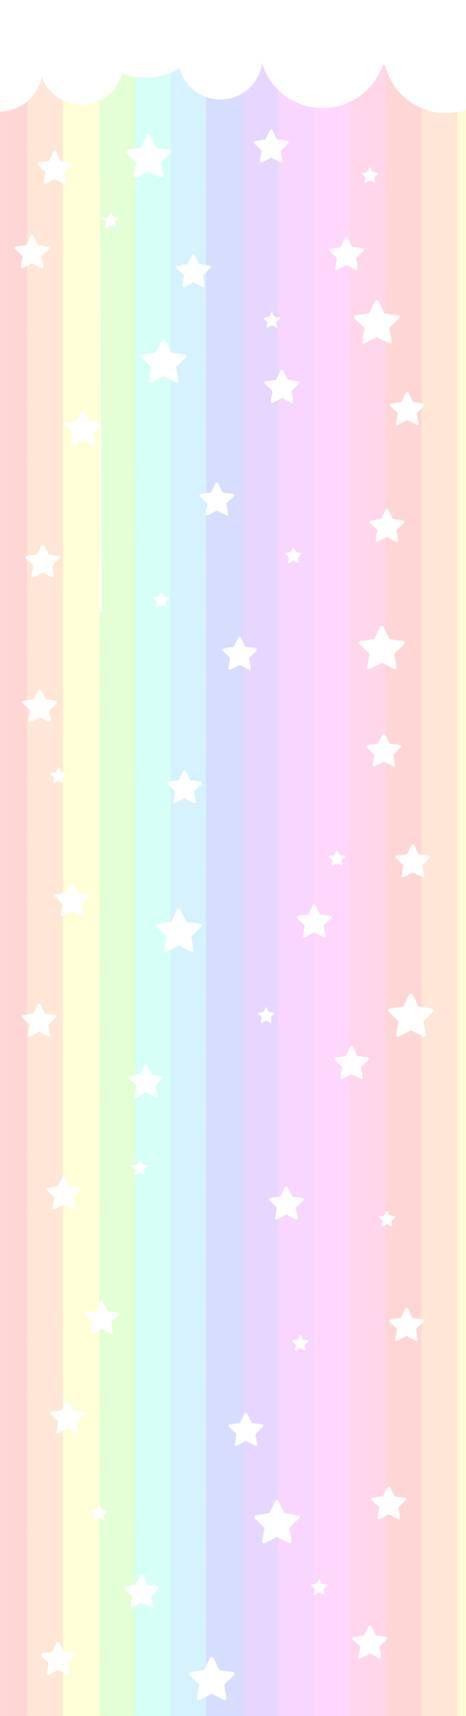 i kno u luv rainbows just TAKE IT by MyaMisguided on DeviantArt